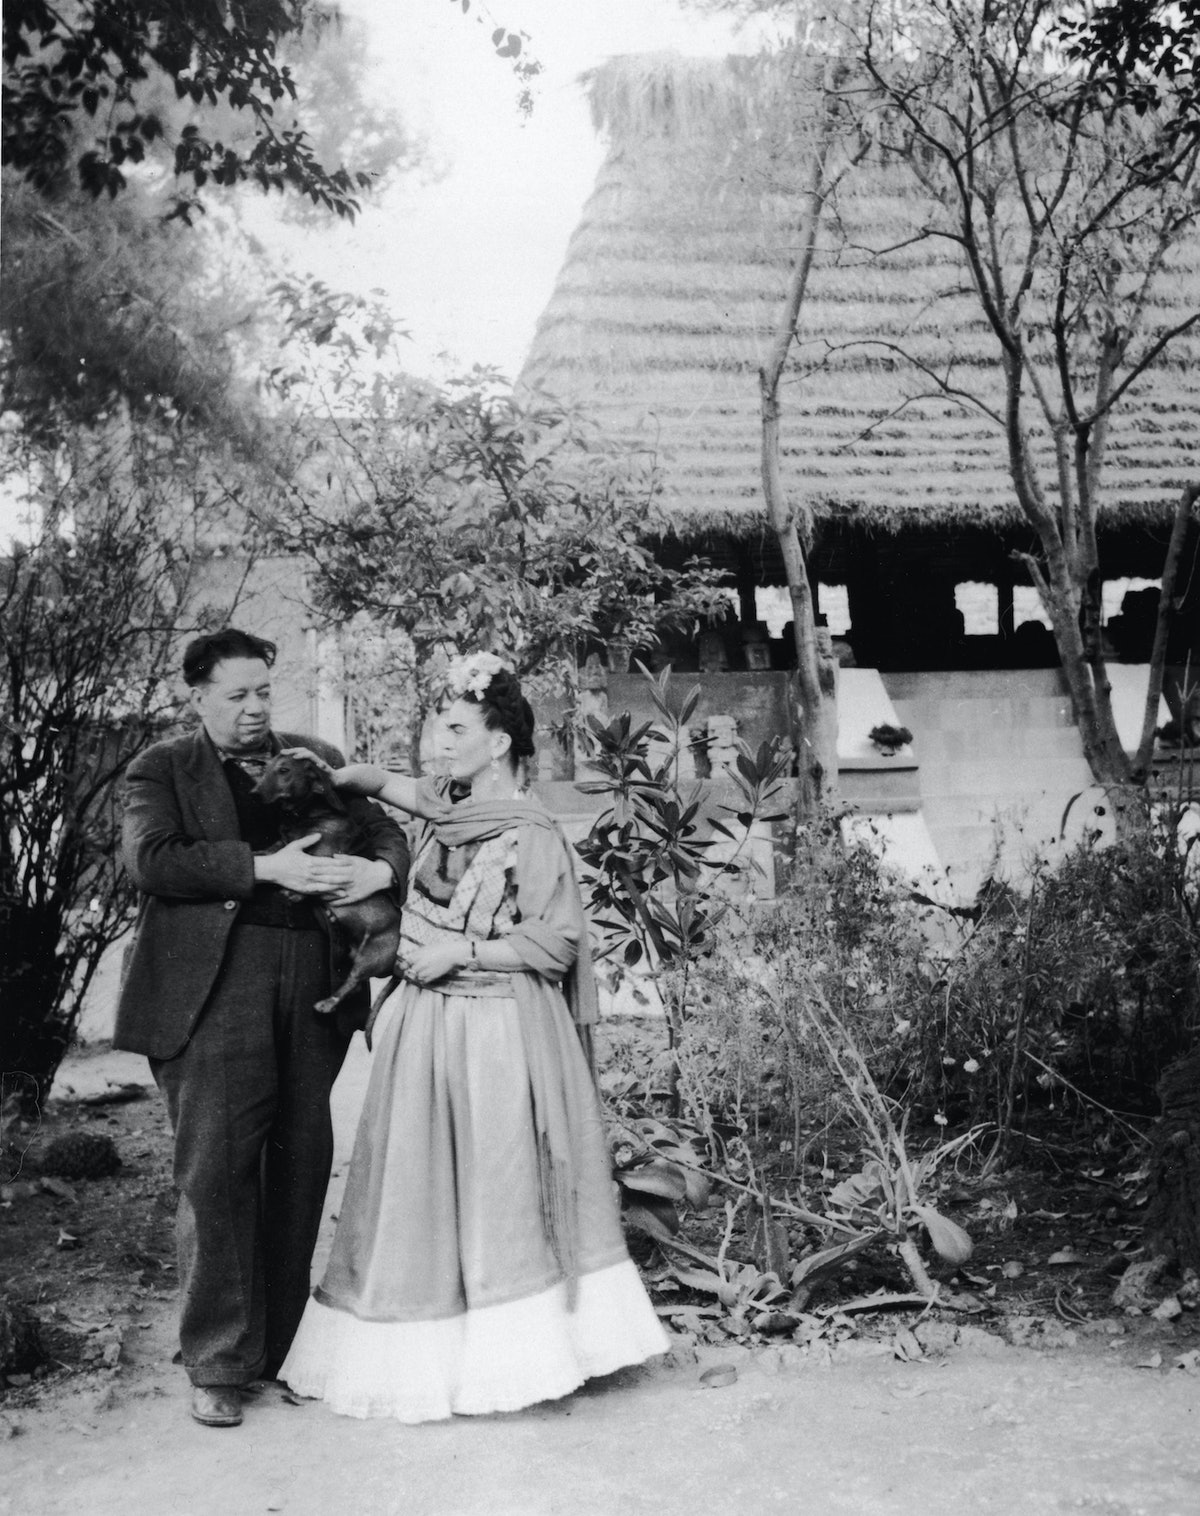 Rivera, Kahlo, & Dog